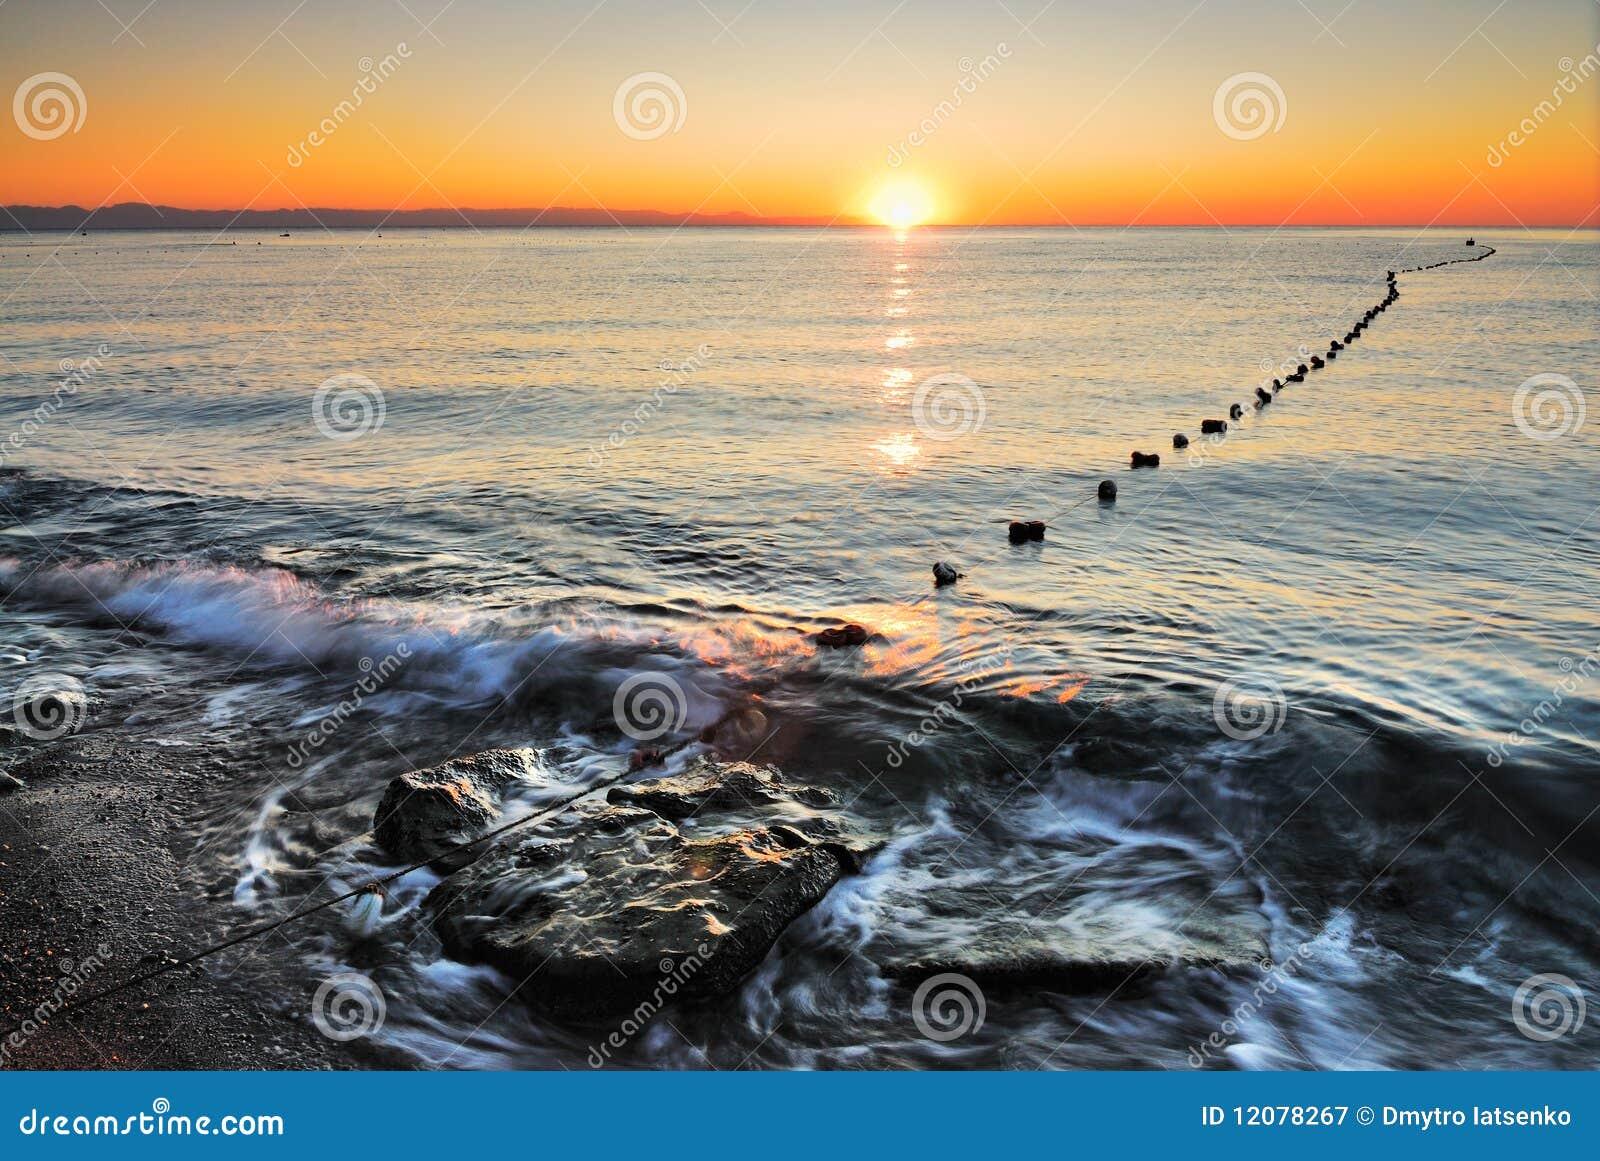 Sunrise on the beach. Turkey. Kemer. Antalya